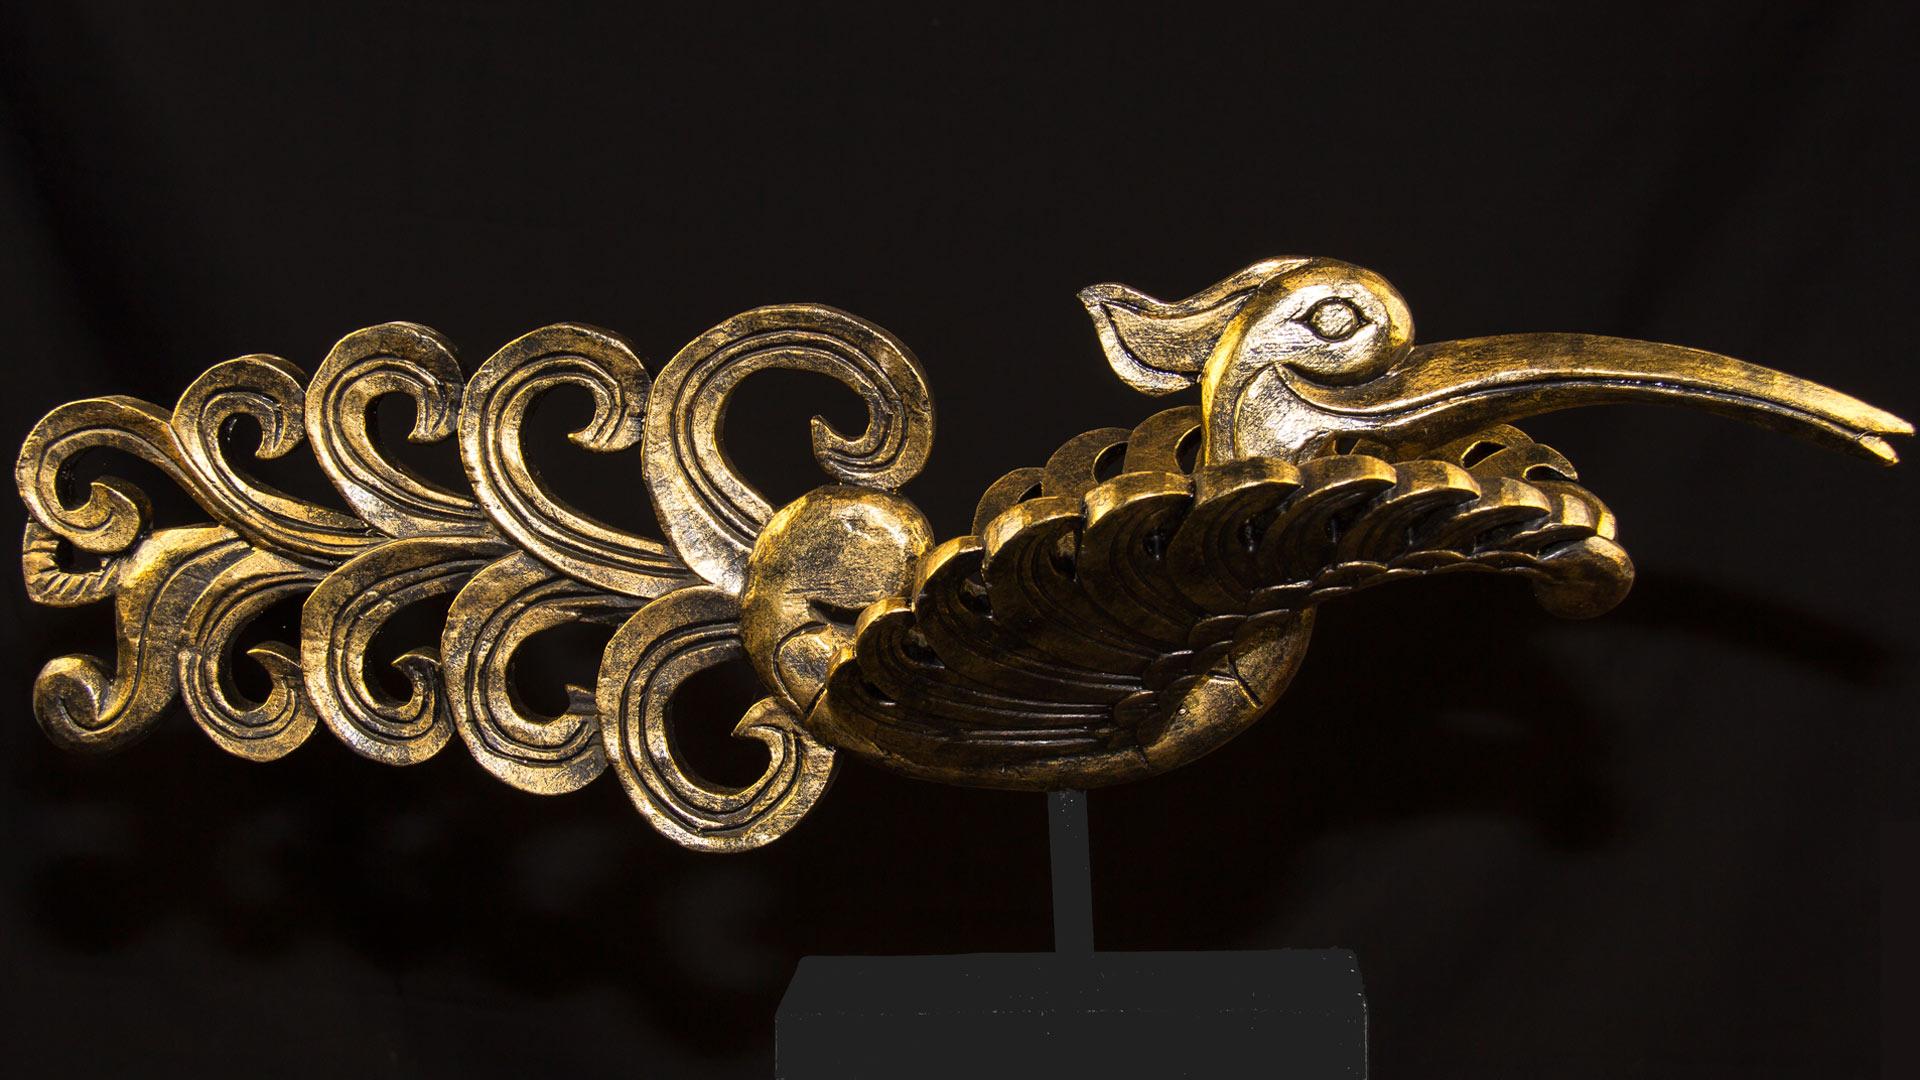 enz-of-the-earth-gold-garuda-1080-IMG_9746